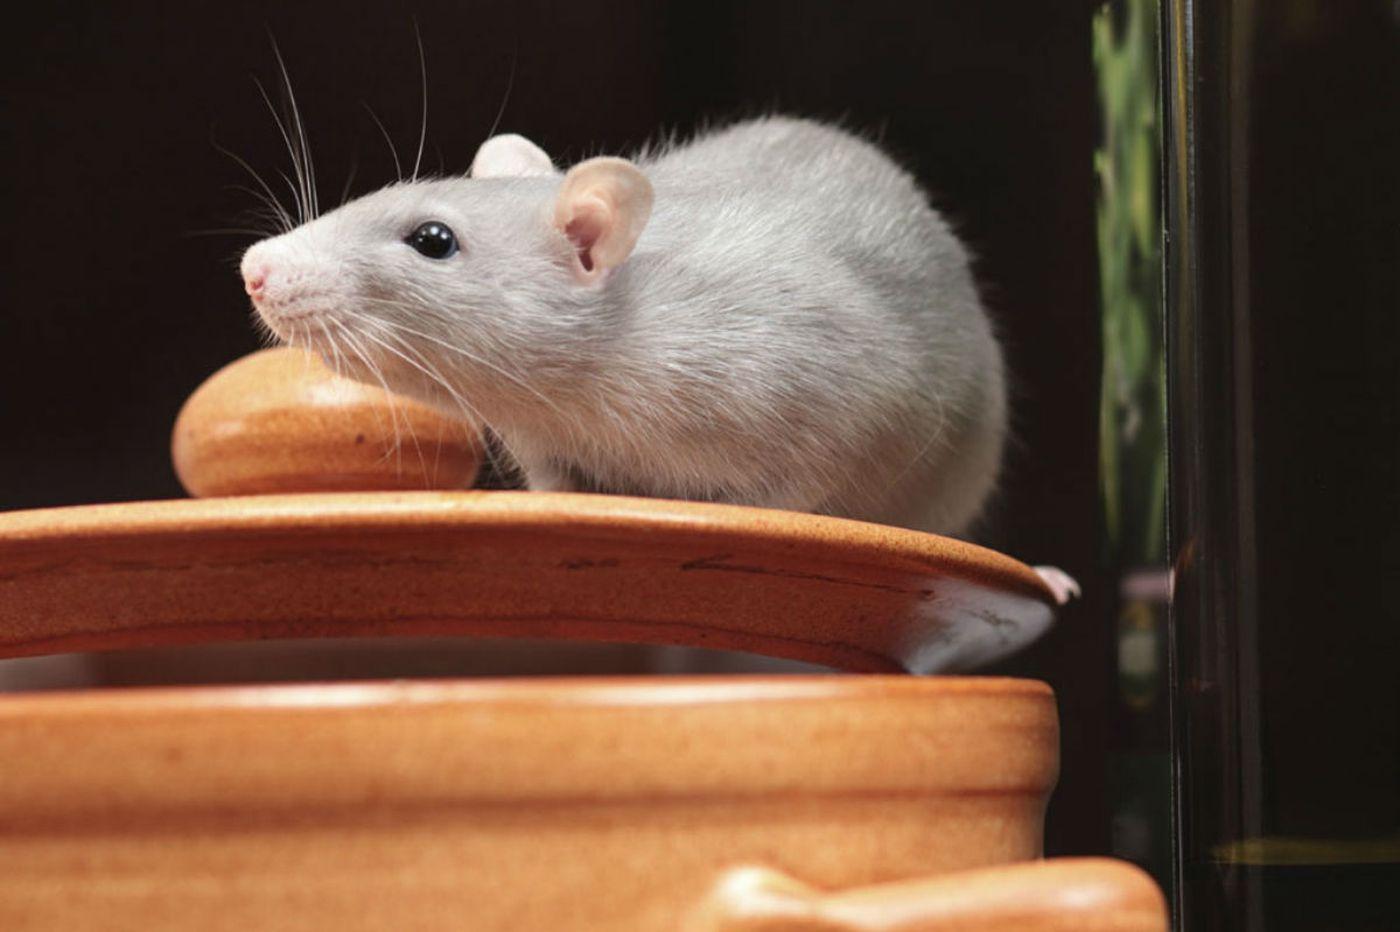 Flu-carrying pet rat found in Pennsylvania